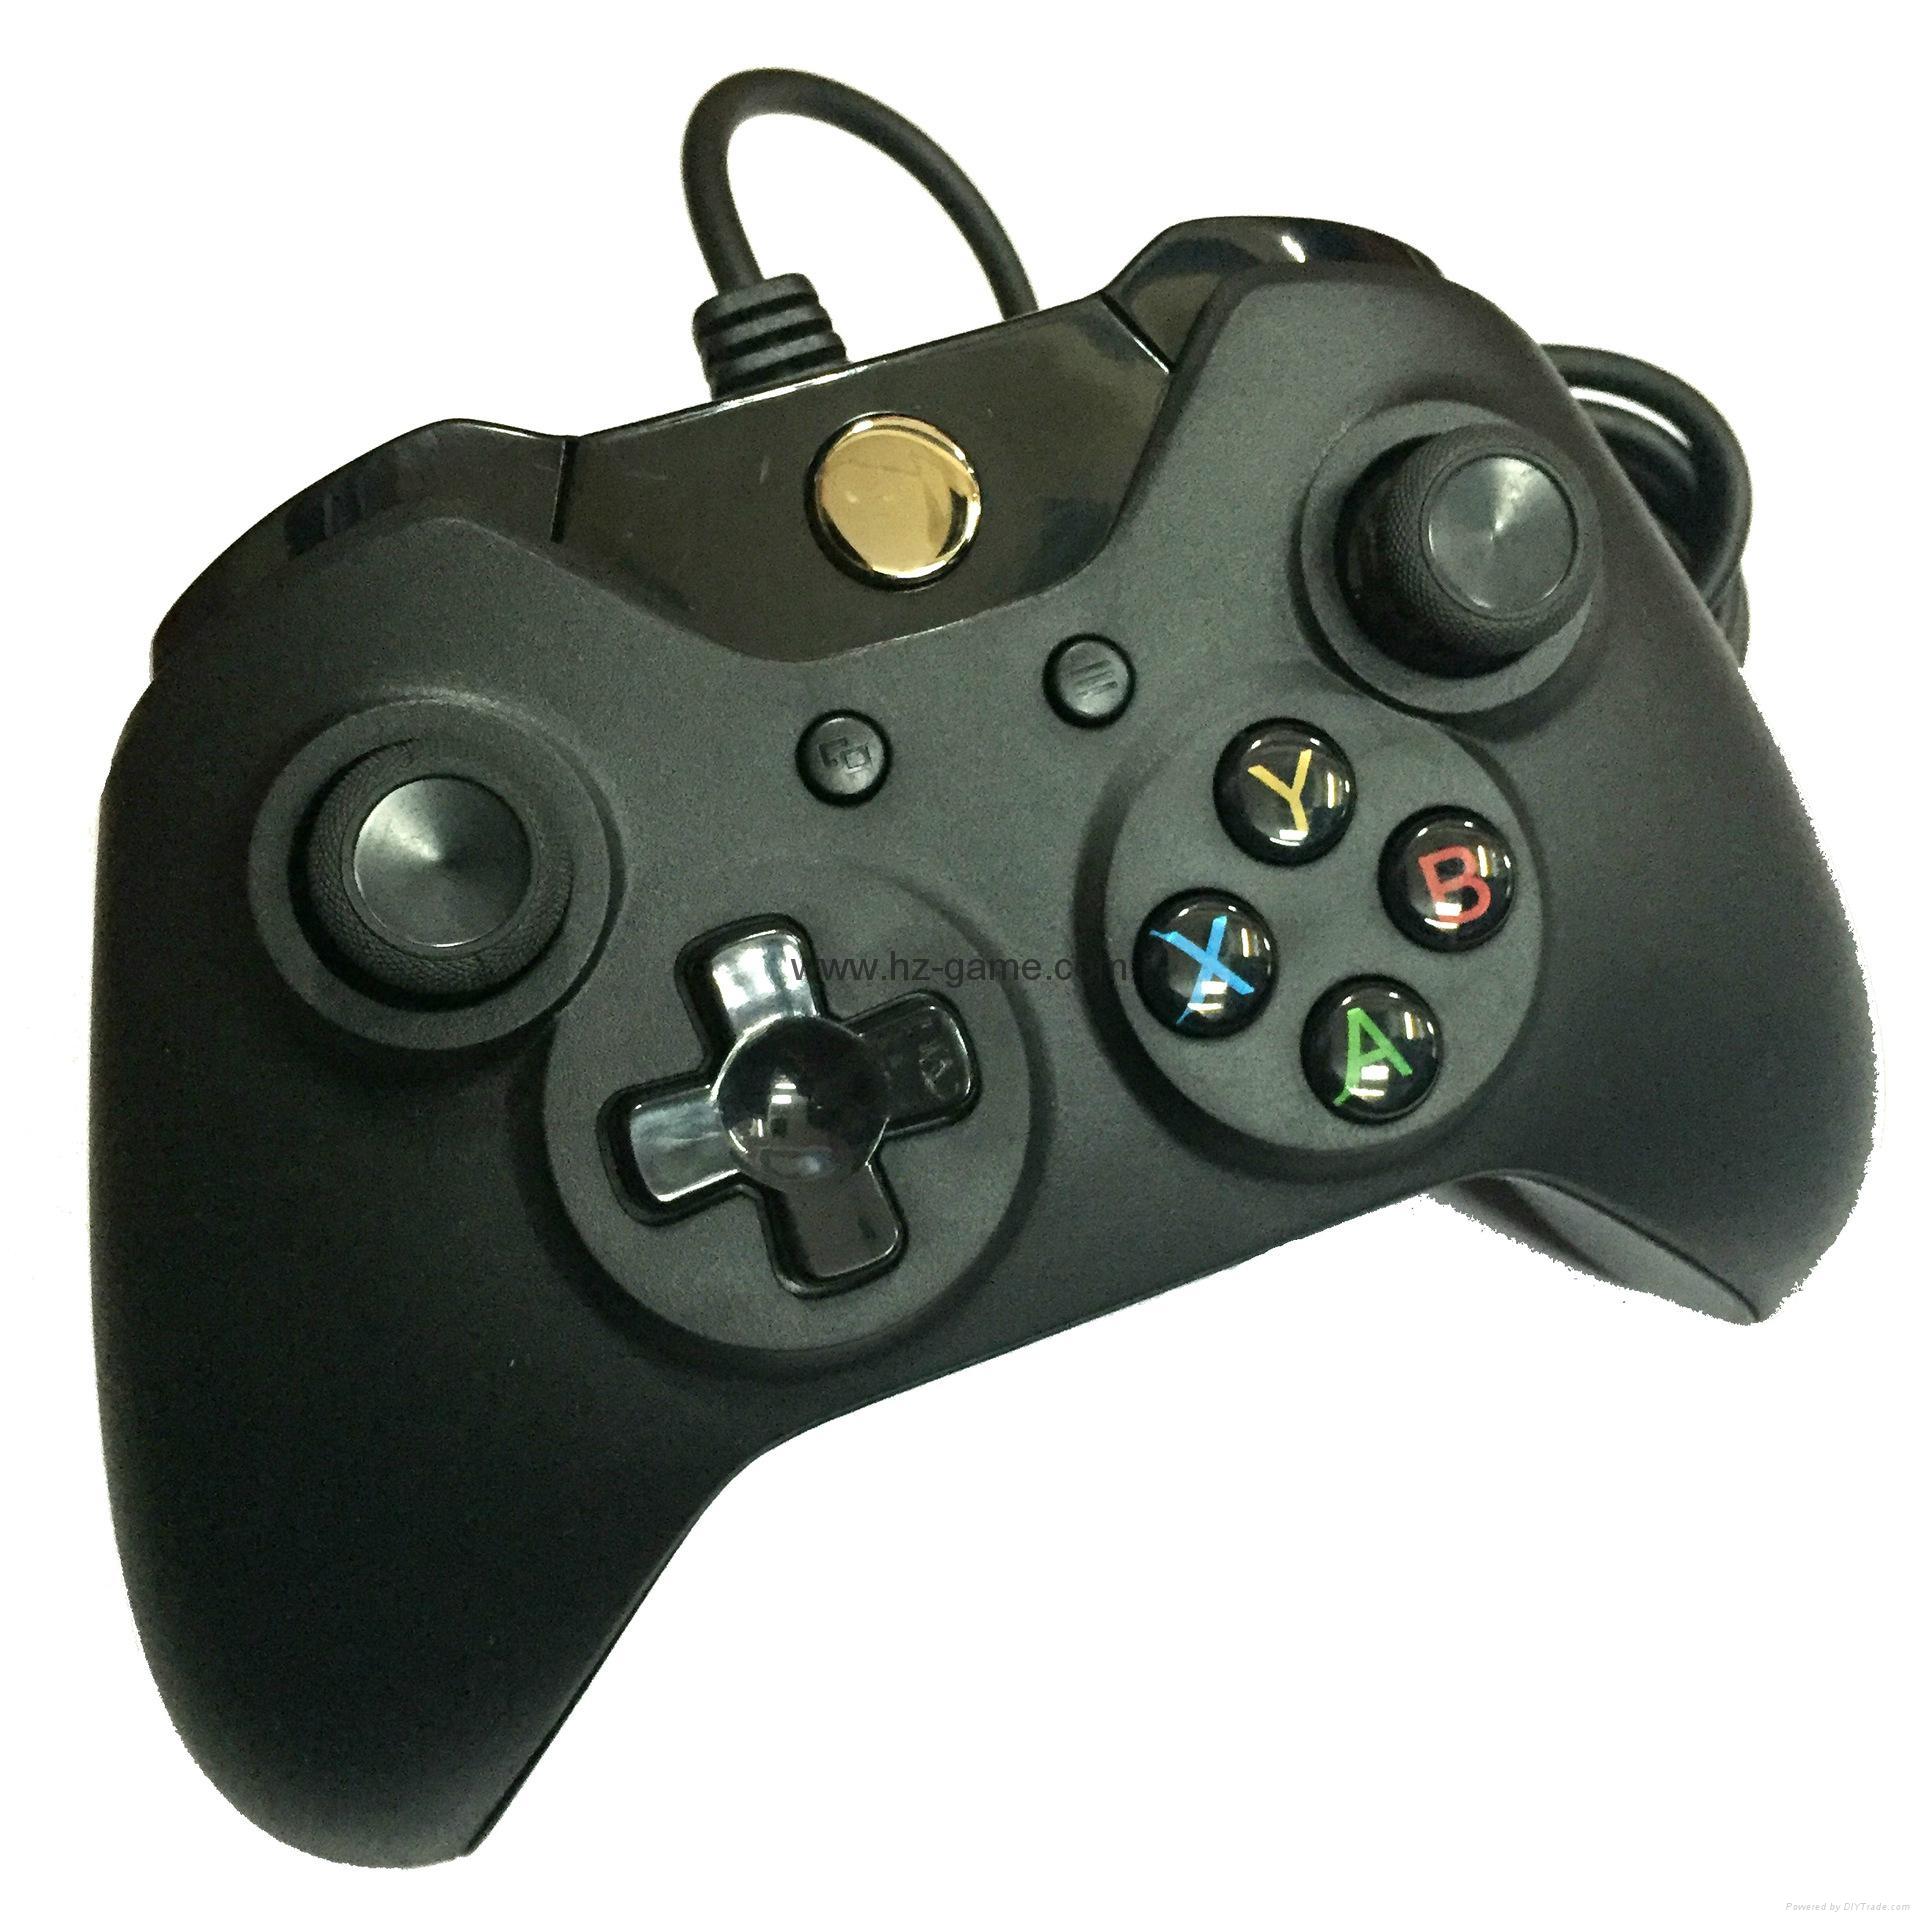 XBOX ONE遊戲手柄 xboxone原裝手柄 無線手柄 360原裝無線遊戲 20